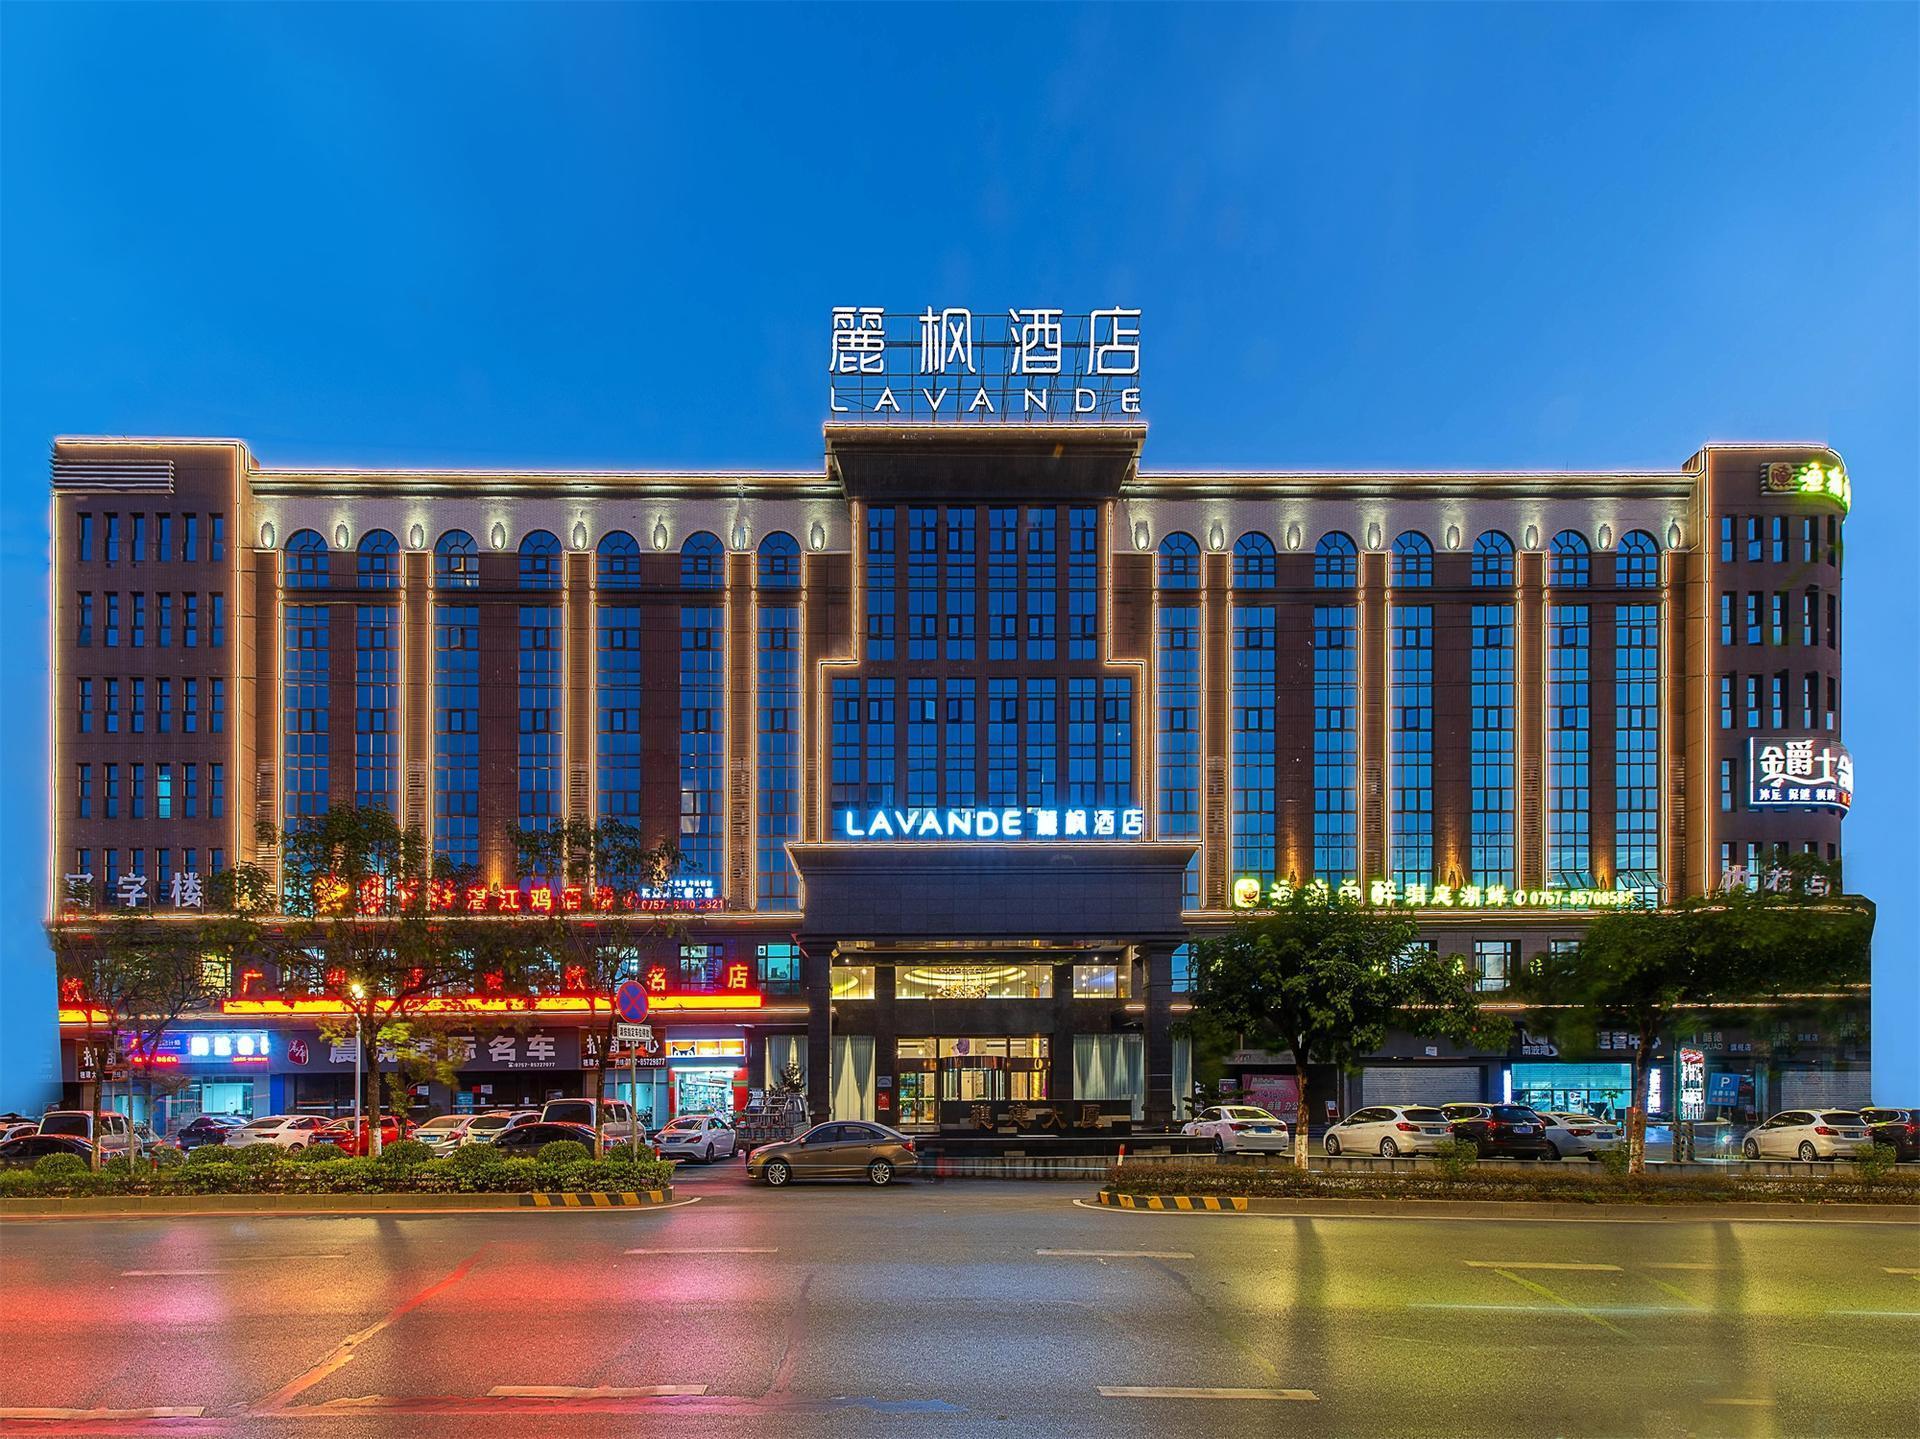 Lavande Hotels Foshan Yangbu Suiyan Dong Road